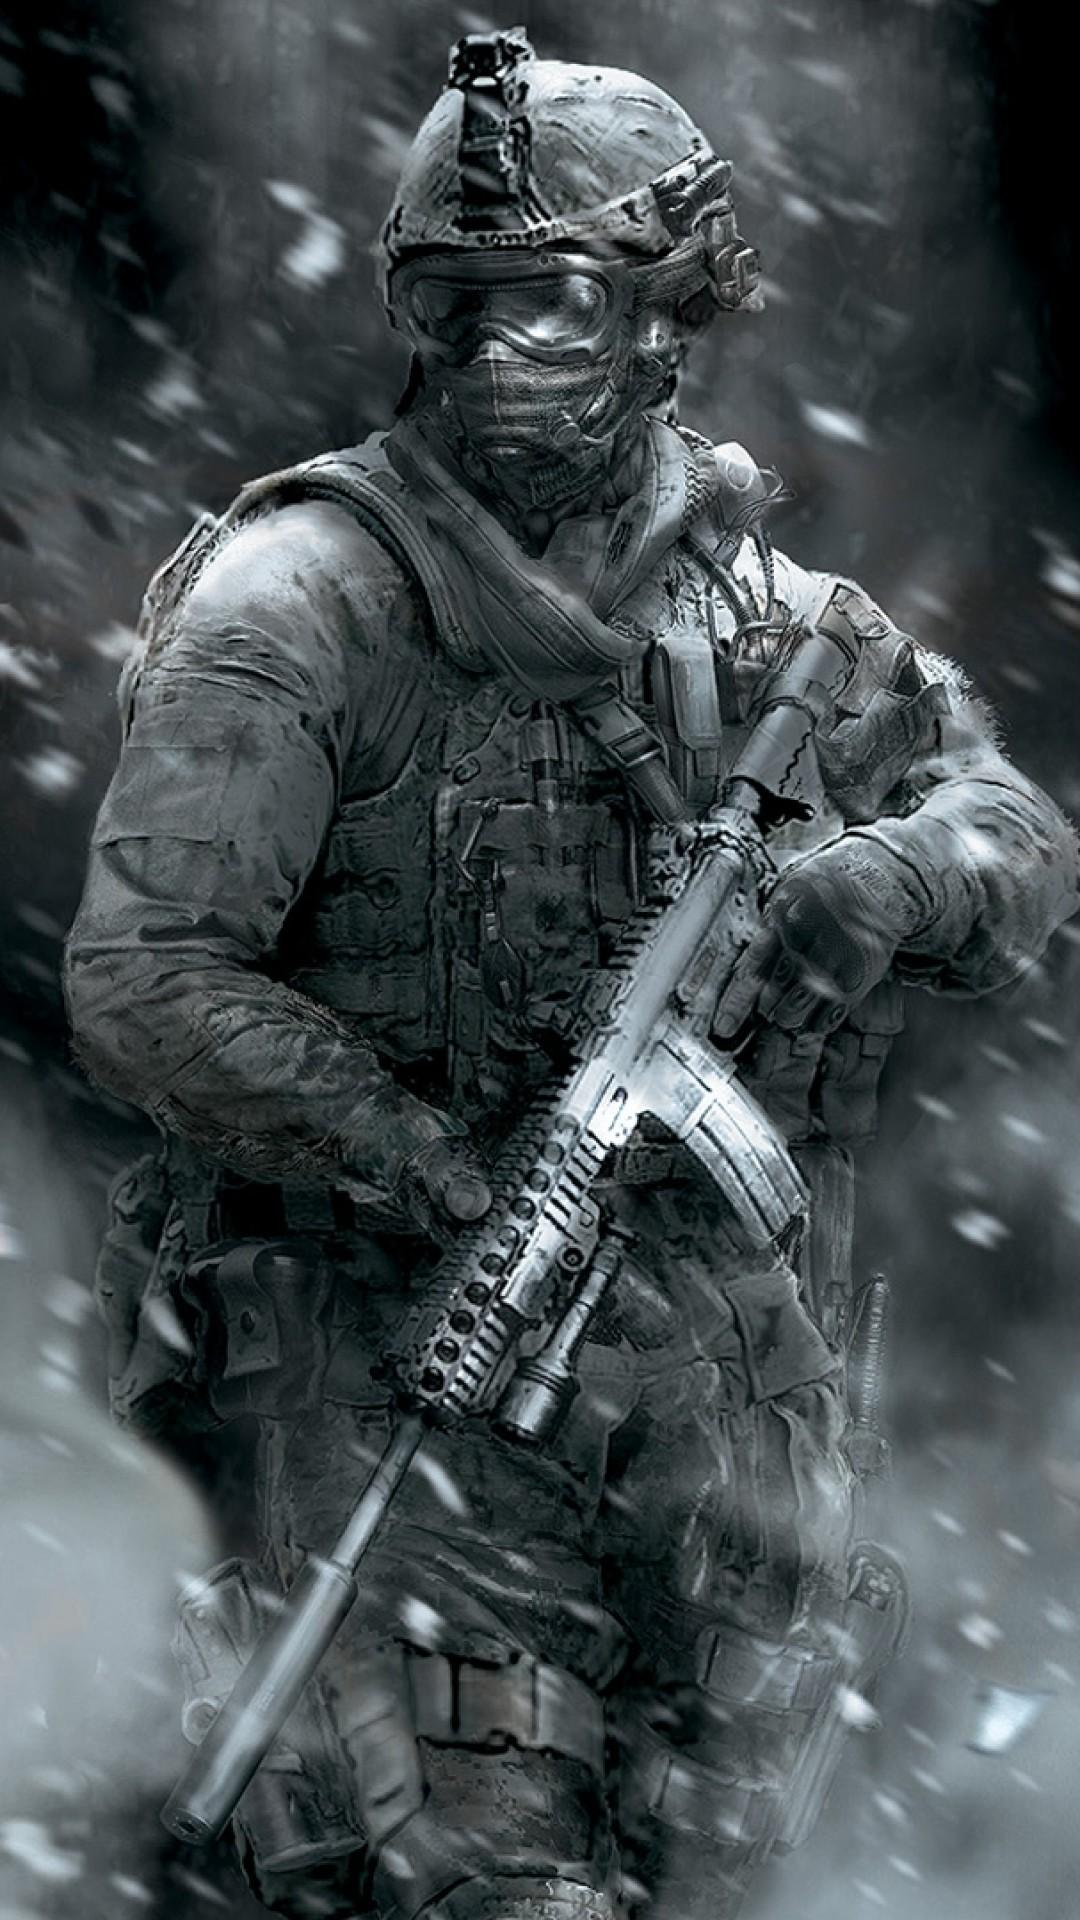 Preview wallpaper call of duty, soldier, gun, smoke, glasses 1080×1920